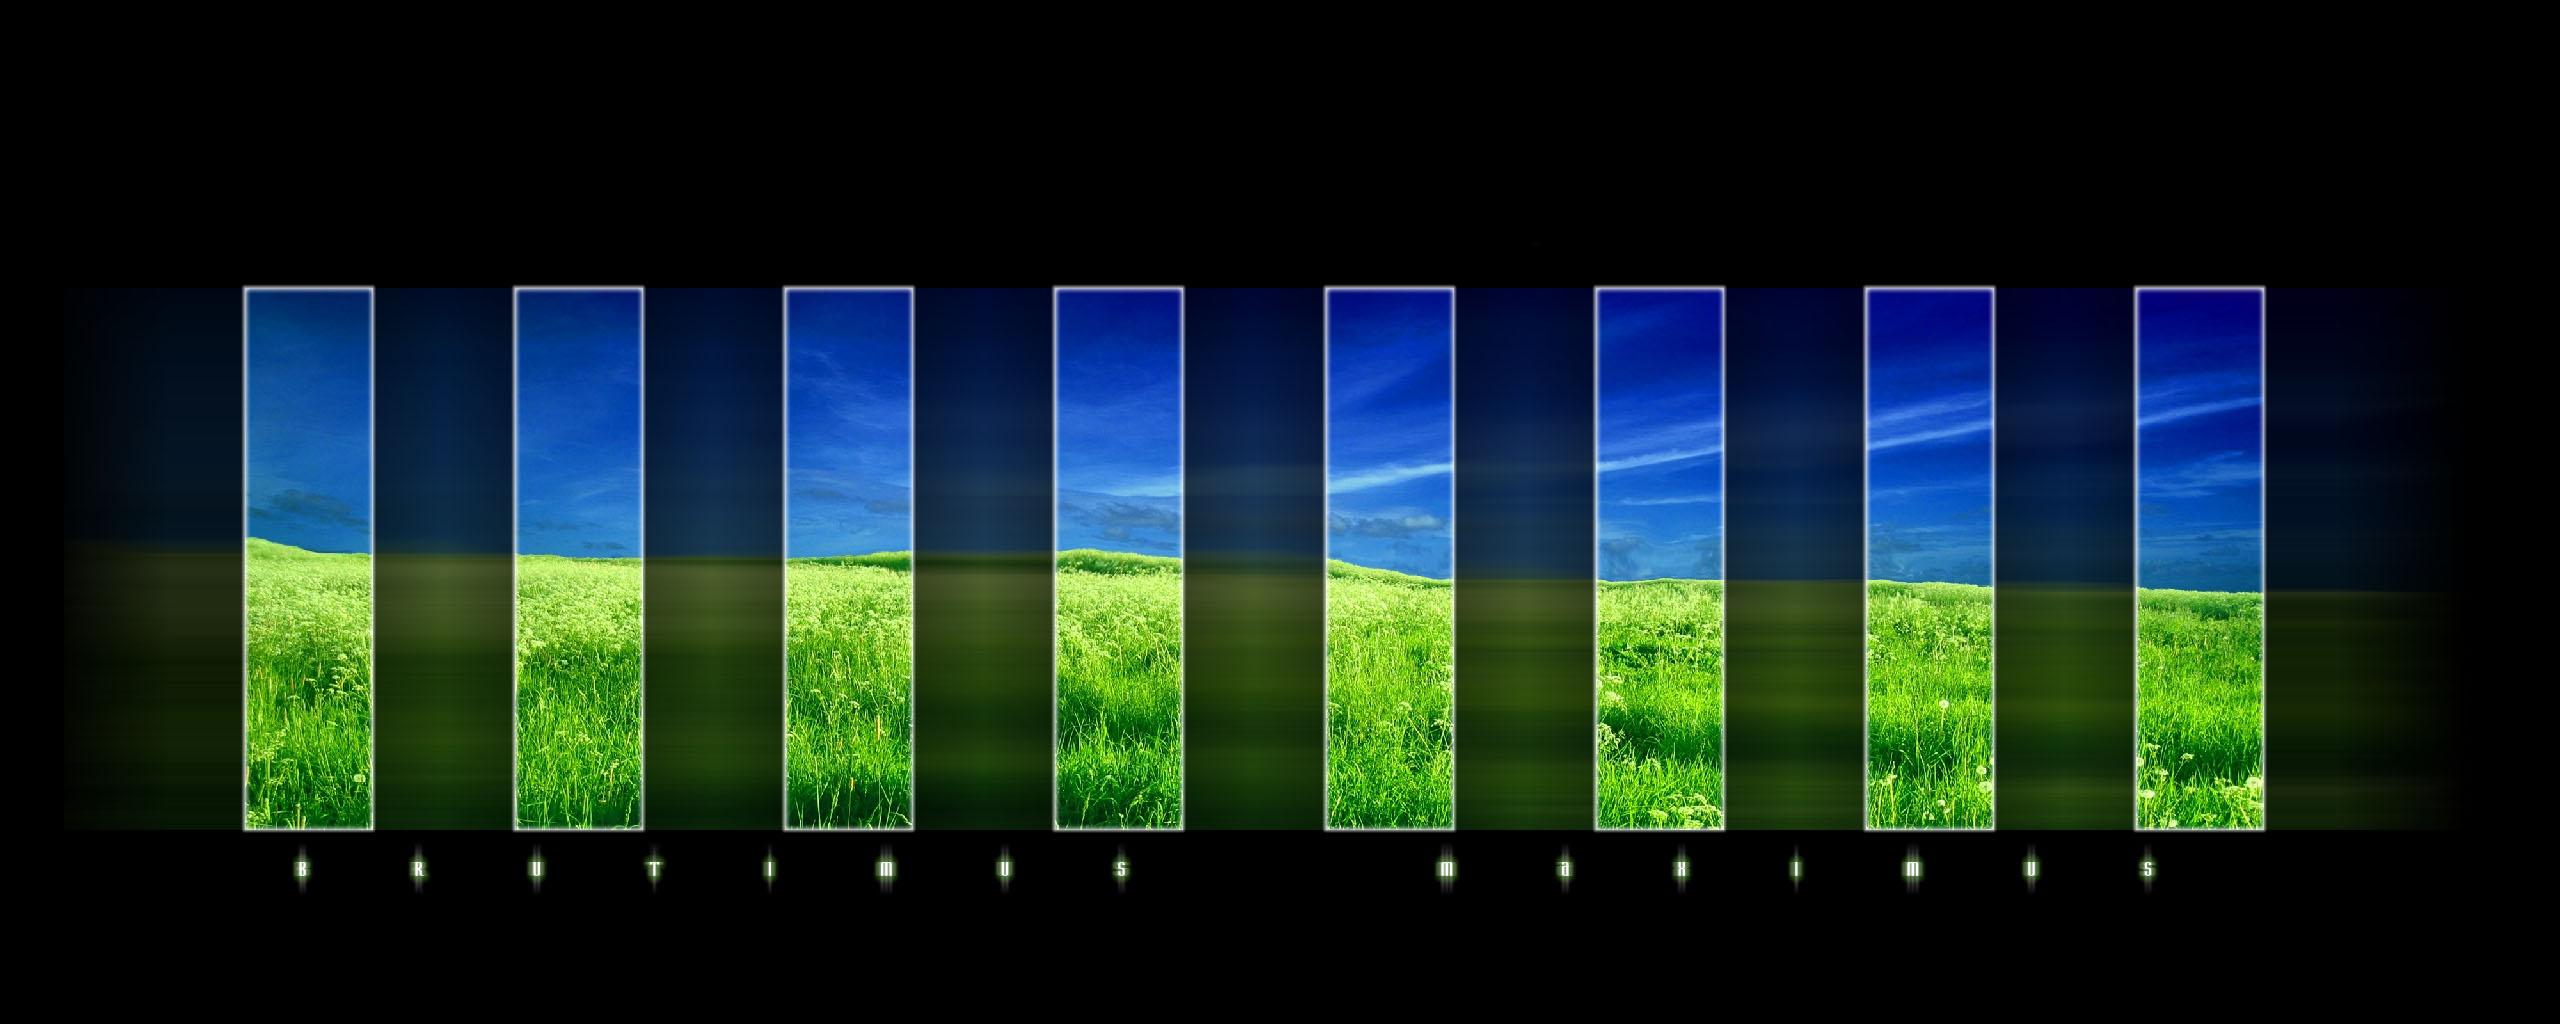 nature dualscreen image